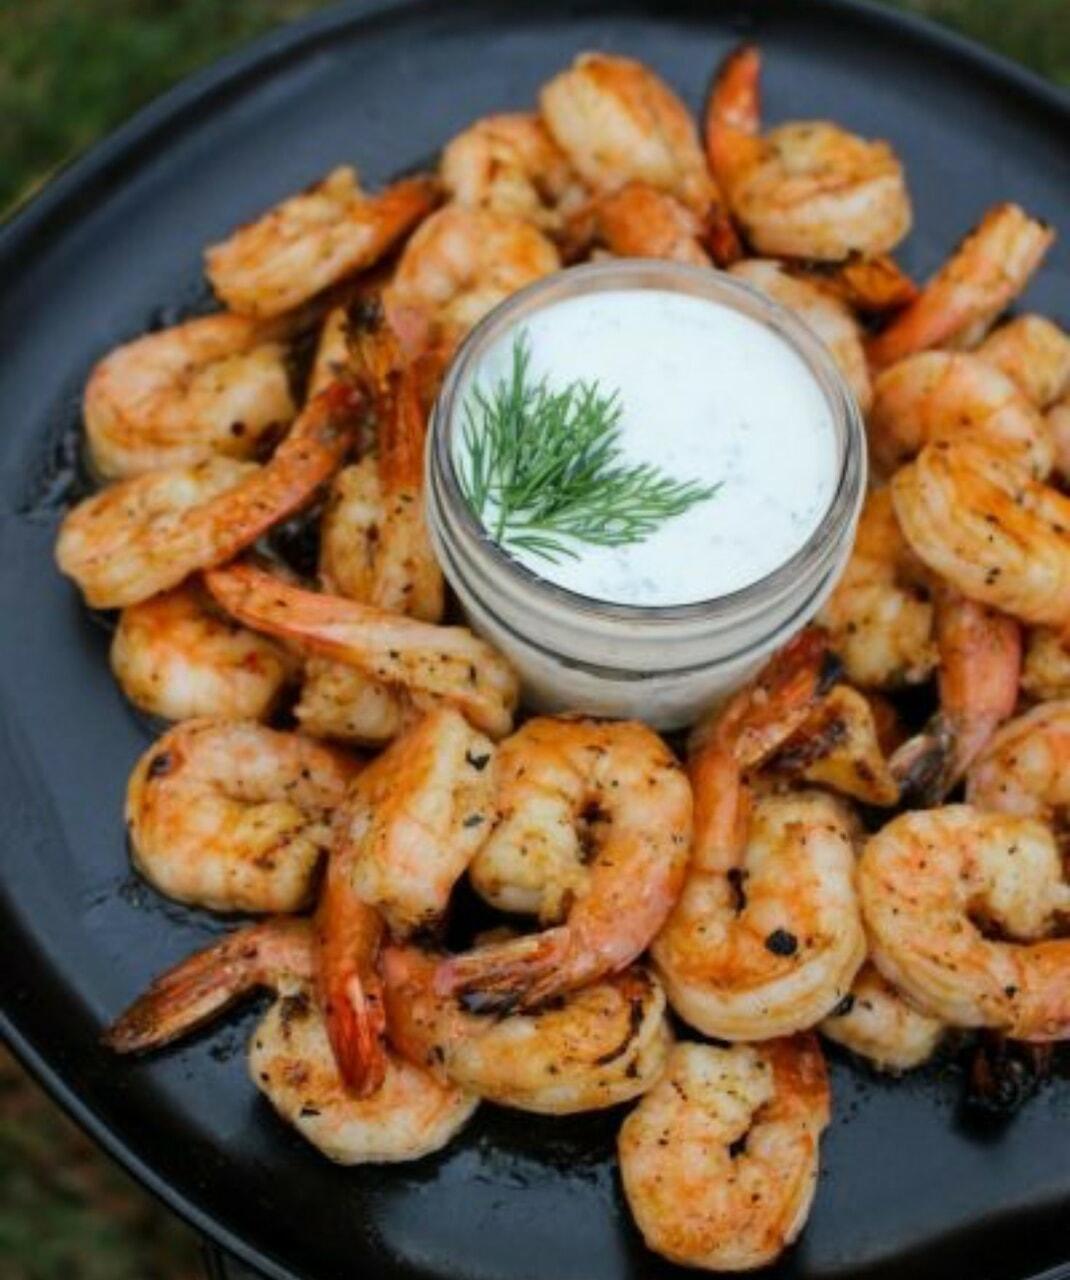 shrimp and food image